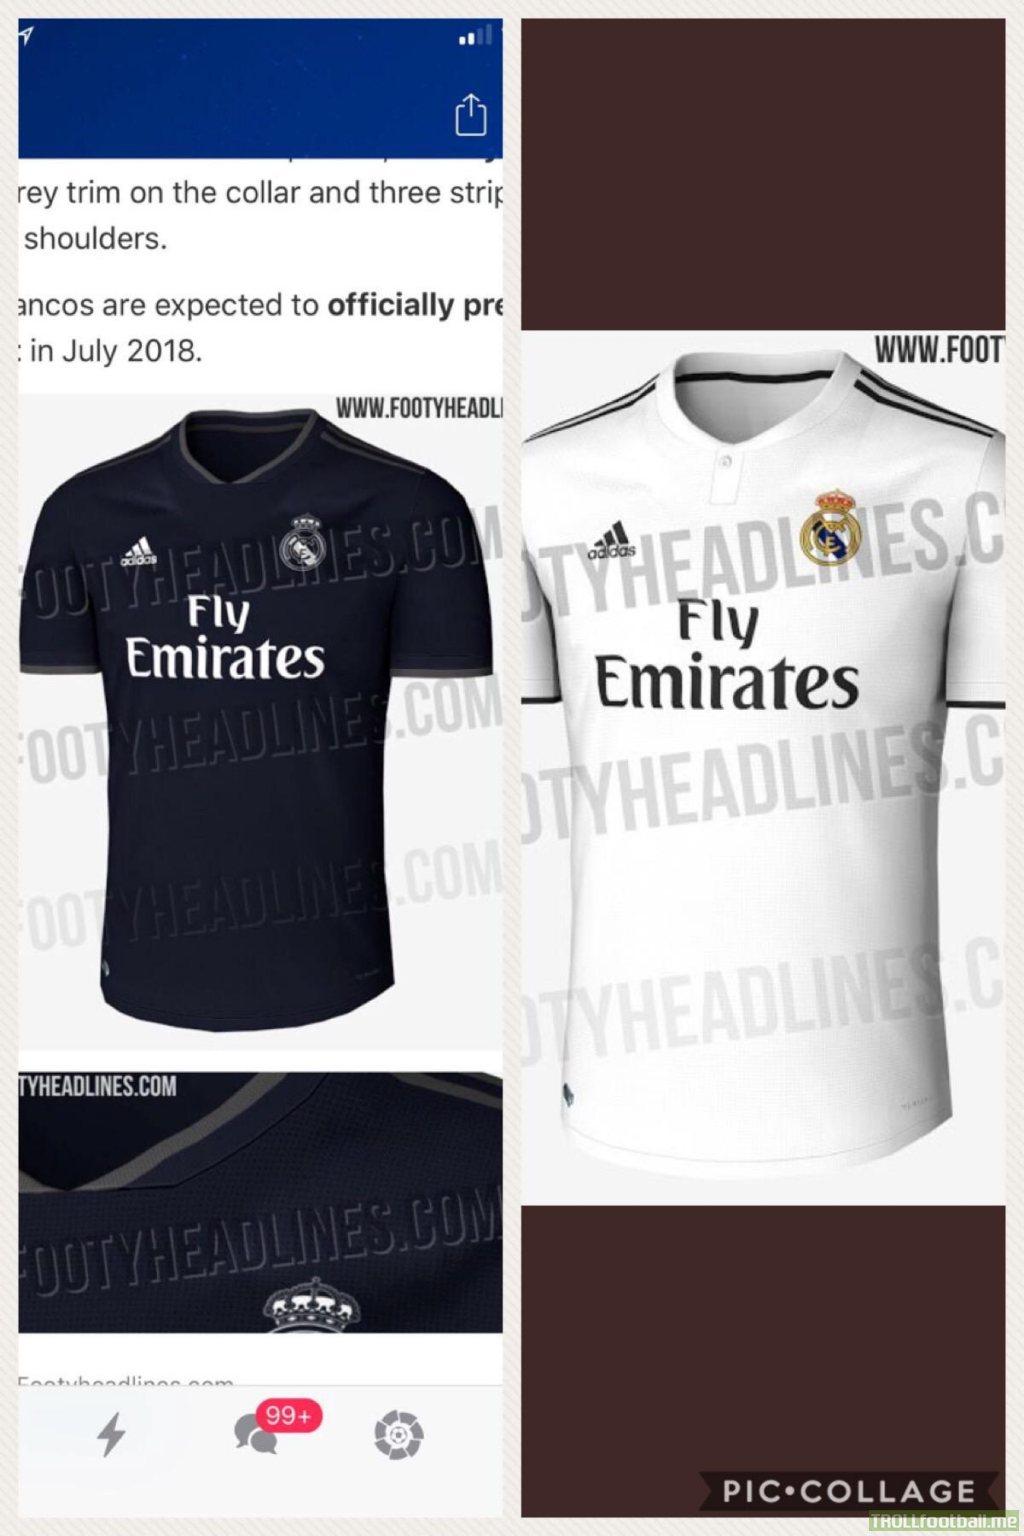 6f654e351 Real Madrid 18 19 Home   Away kits leaked